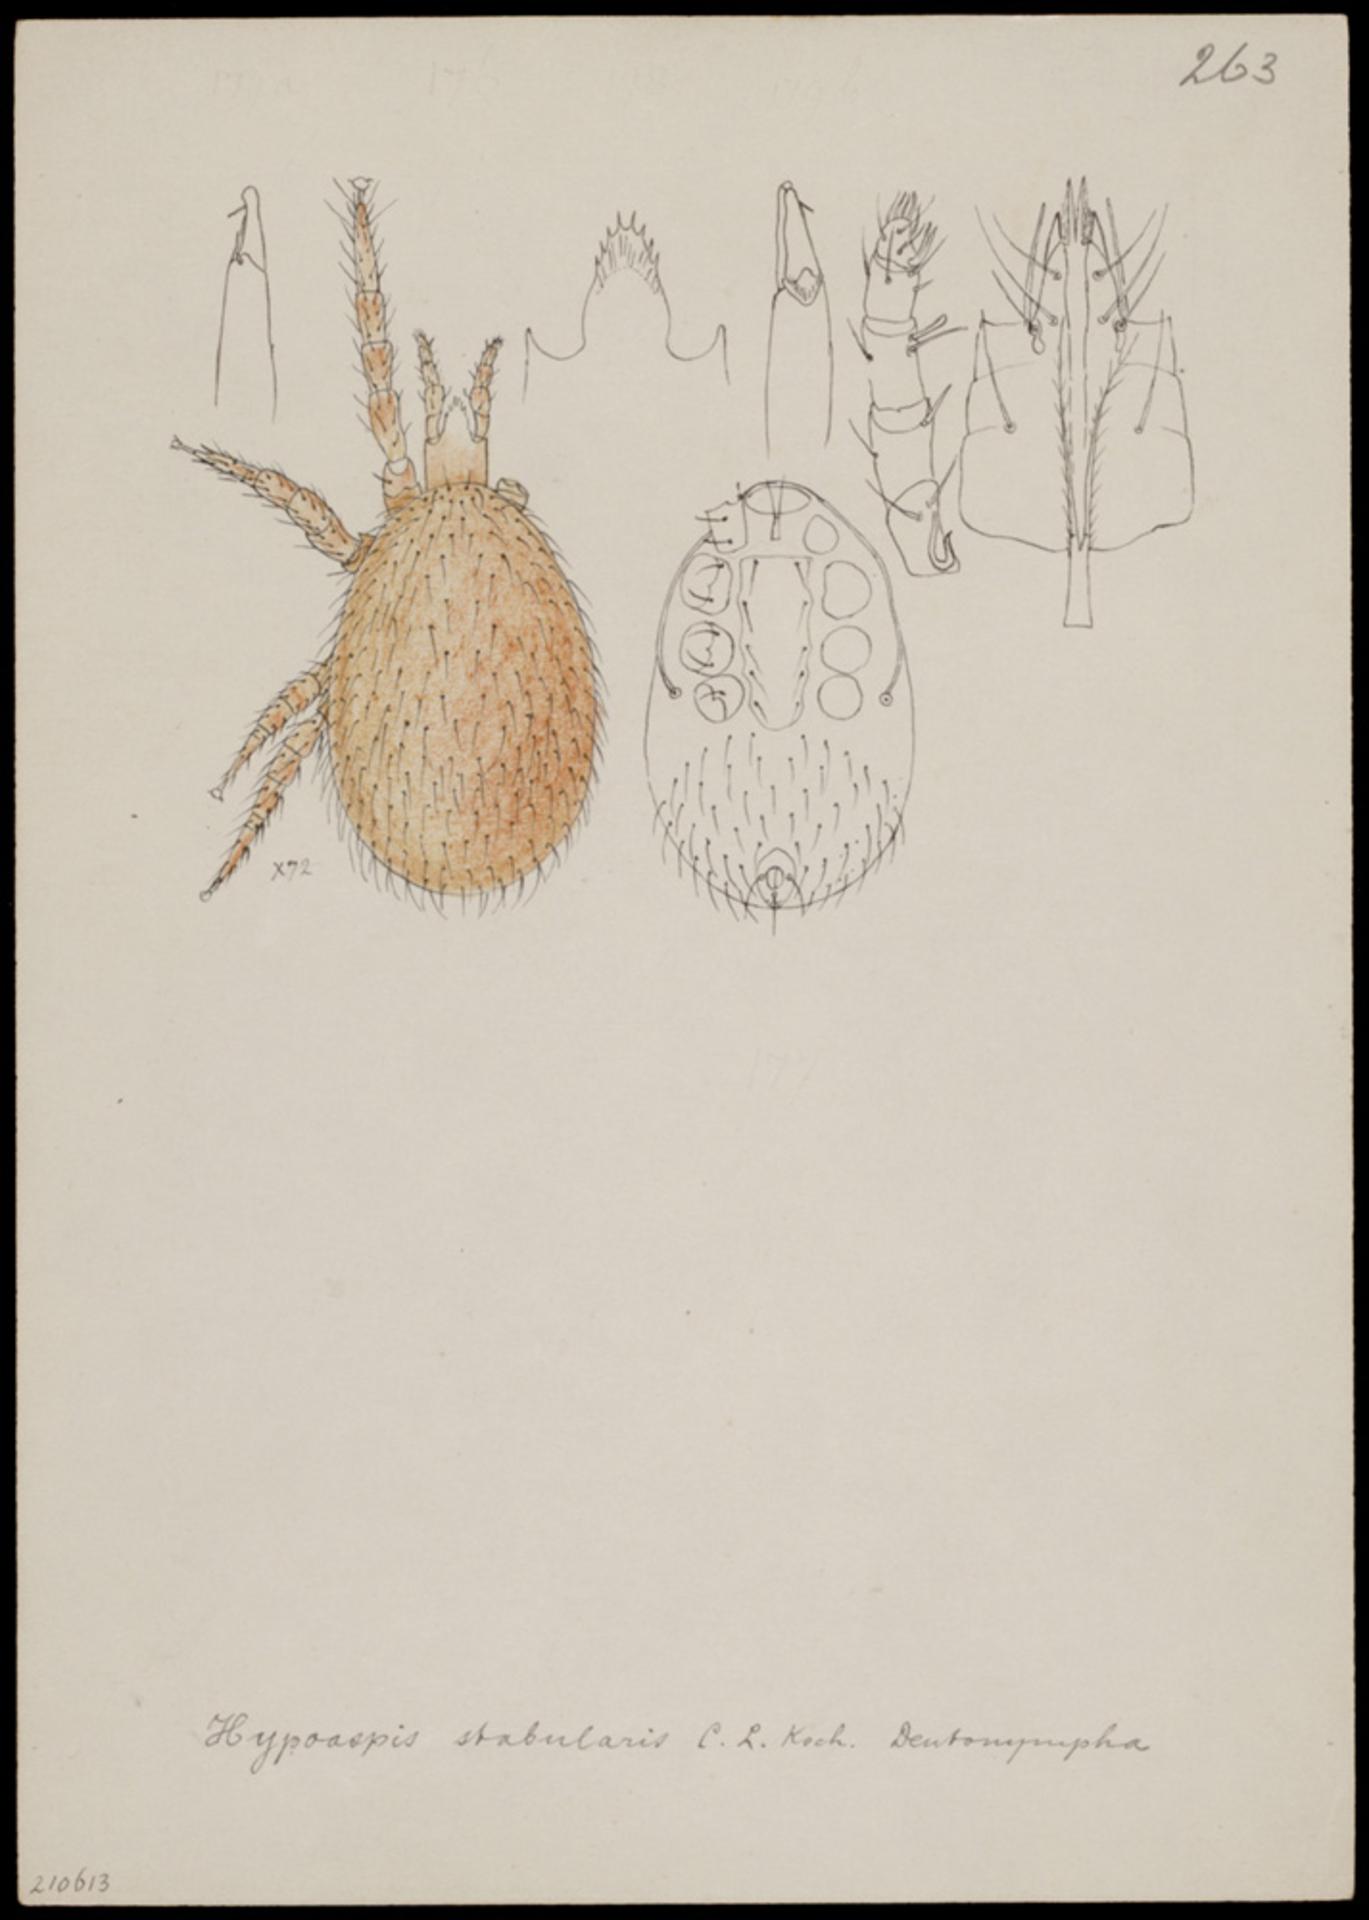 RMNH.ART.1087   Hypoaspis stabularis (C. L. Koch)